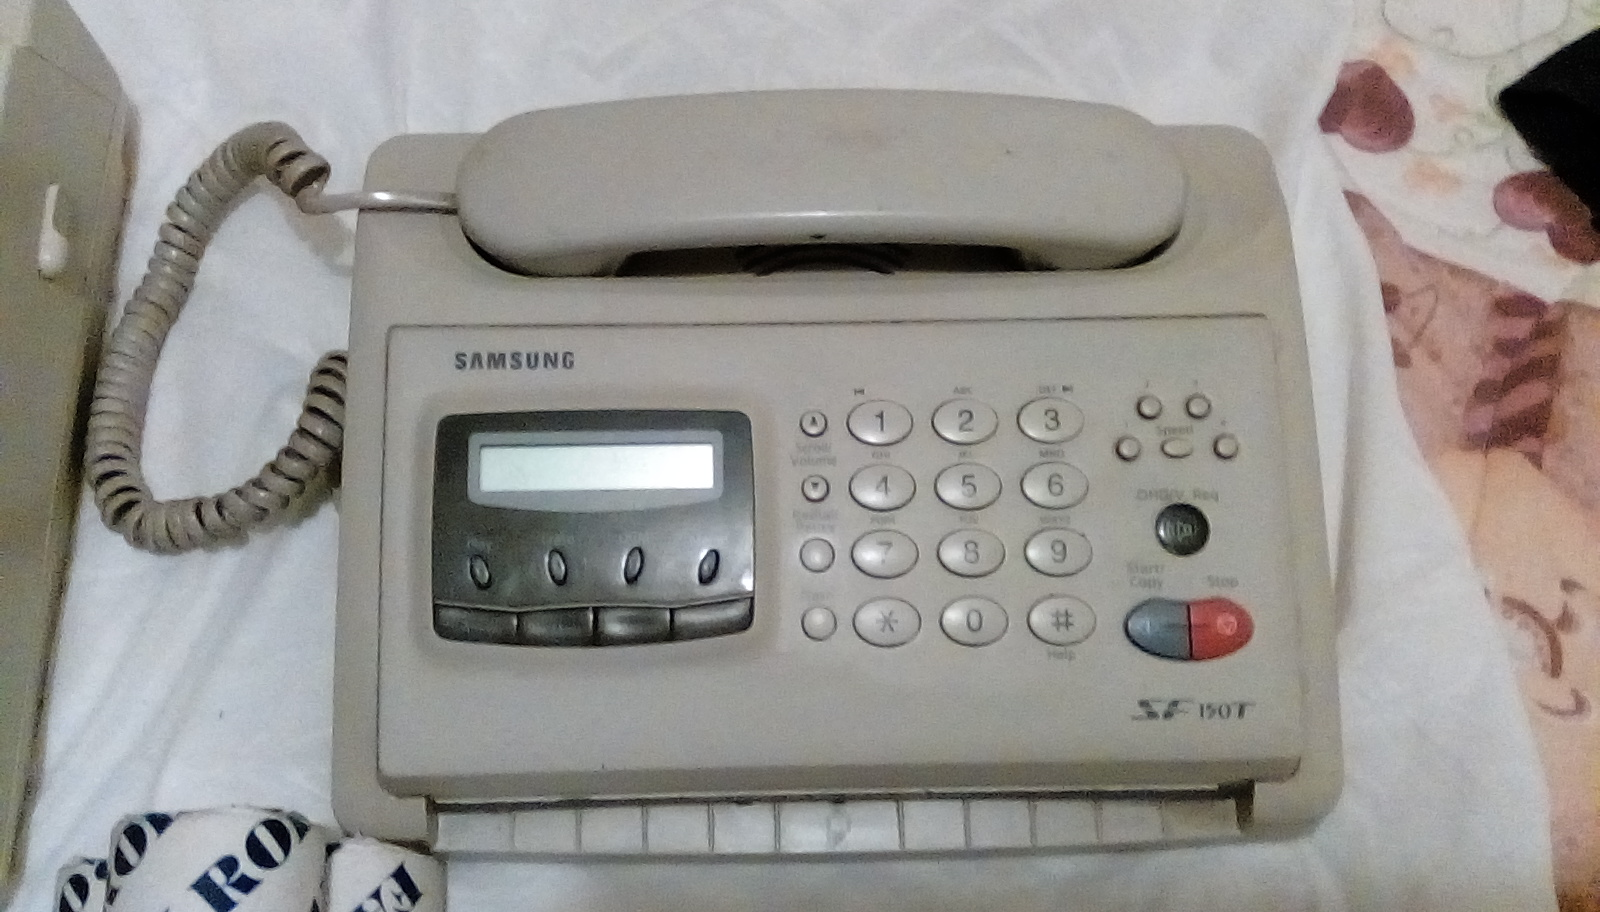 SAMSUNG , telephone ,fax , copier , printers.